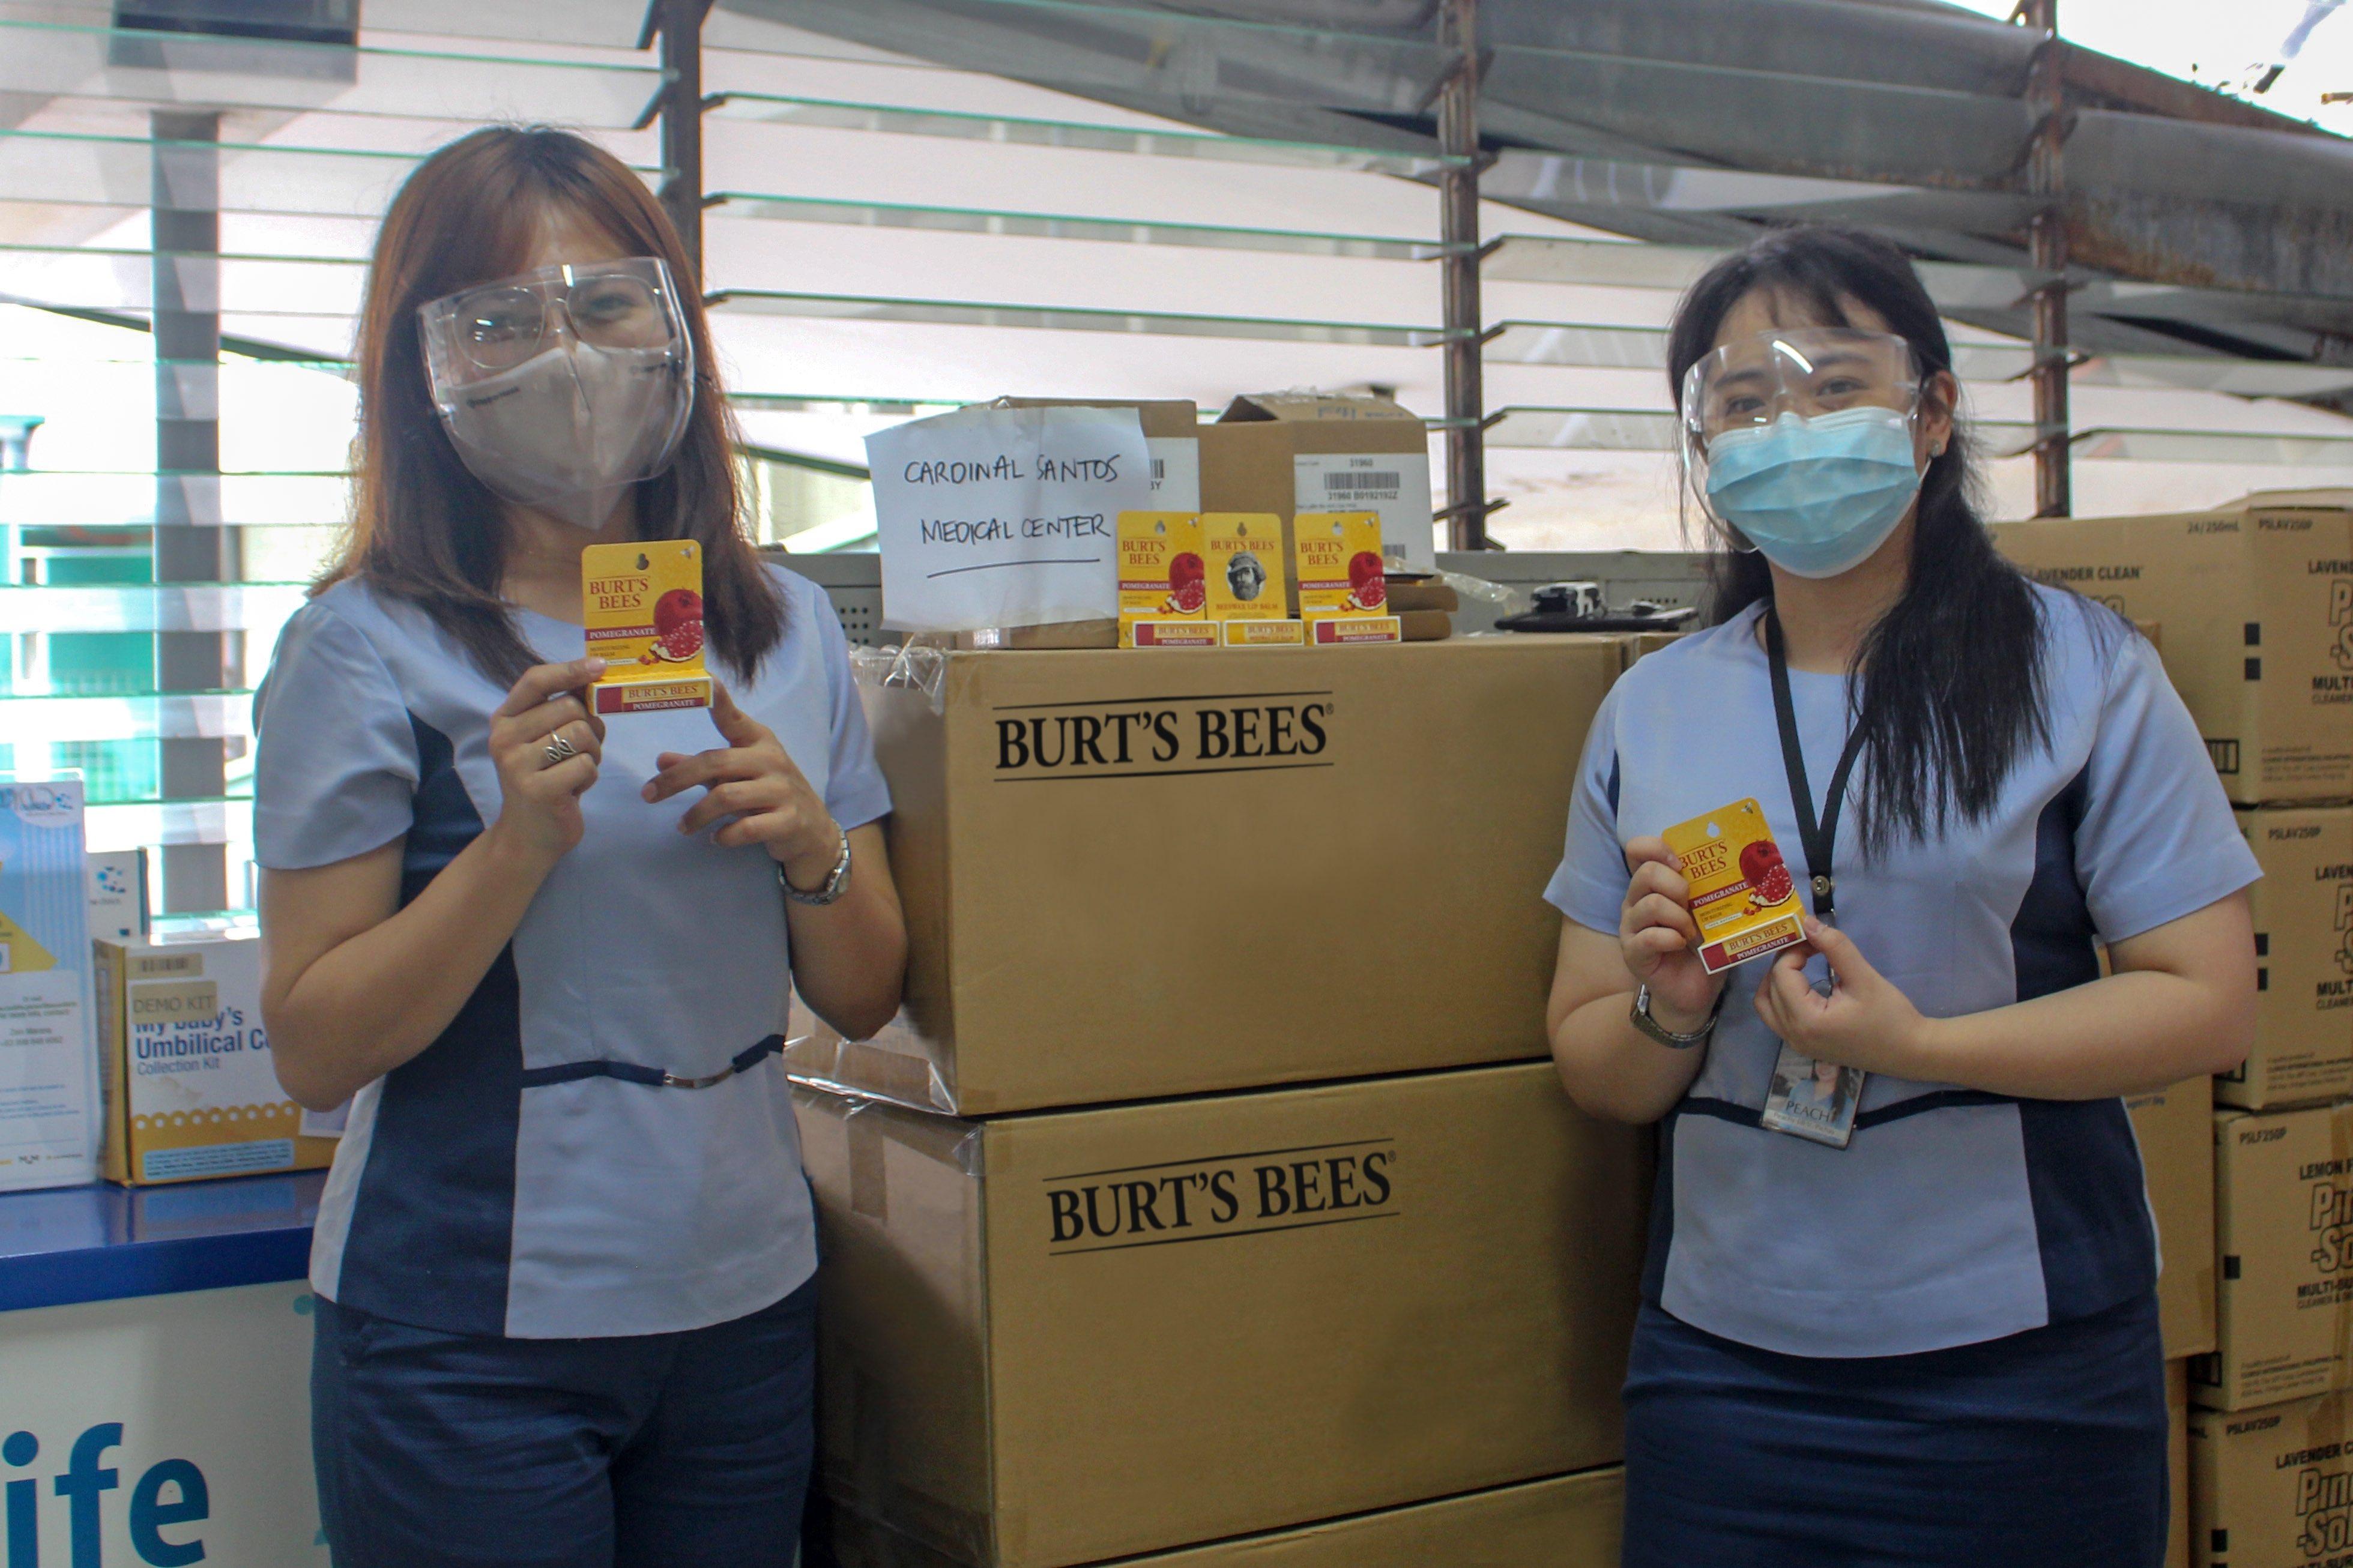 Burt's Bees donates 1,000 lipbalms to five hospitals